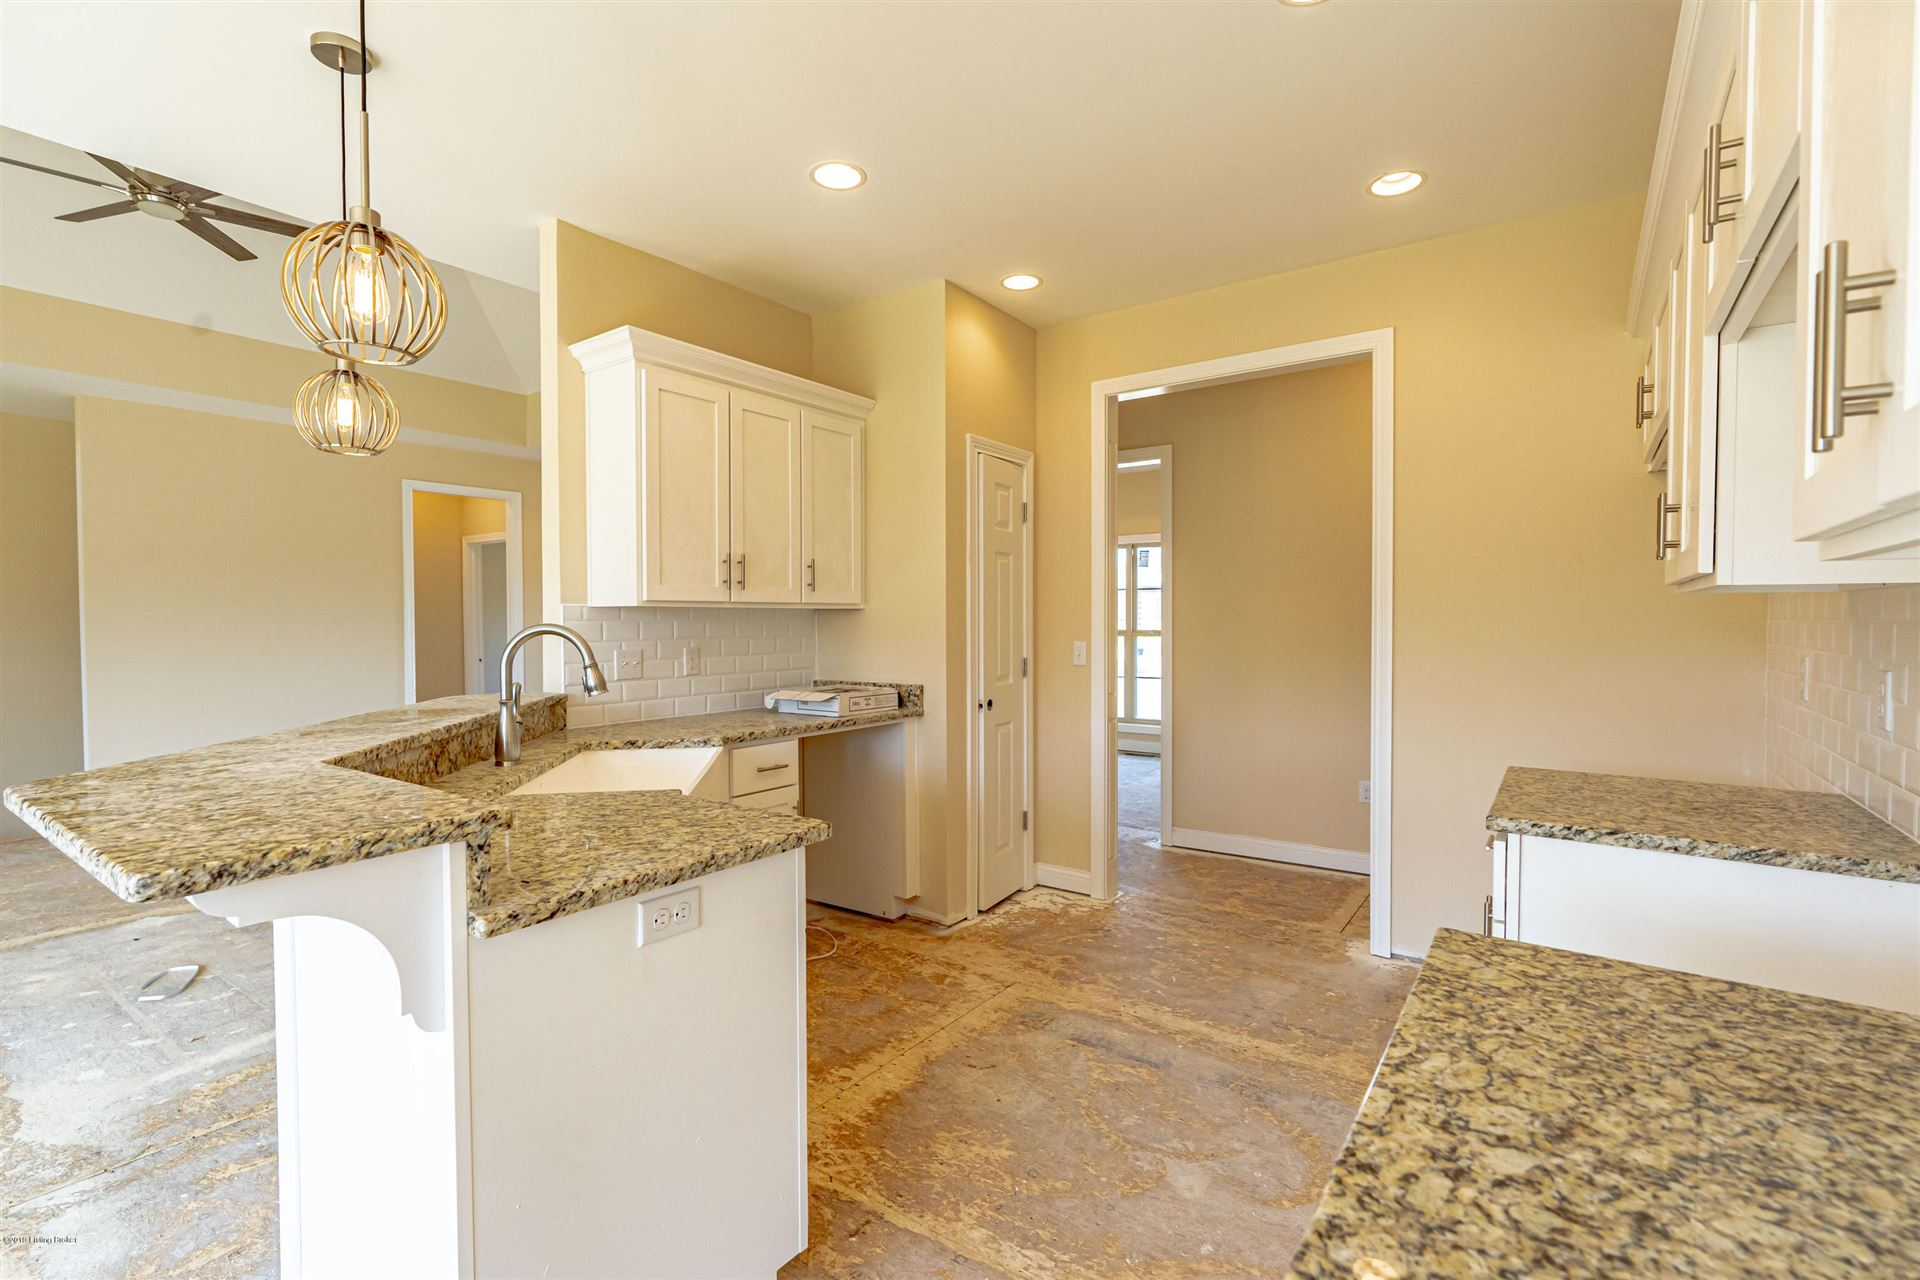 Property Image Of 1070 Morning Glory Ln In Shelbyville, Ky